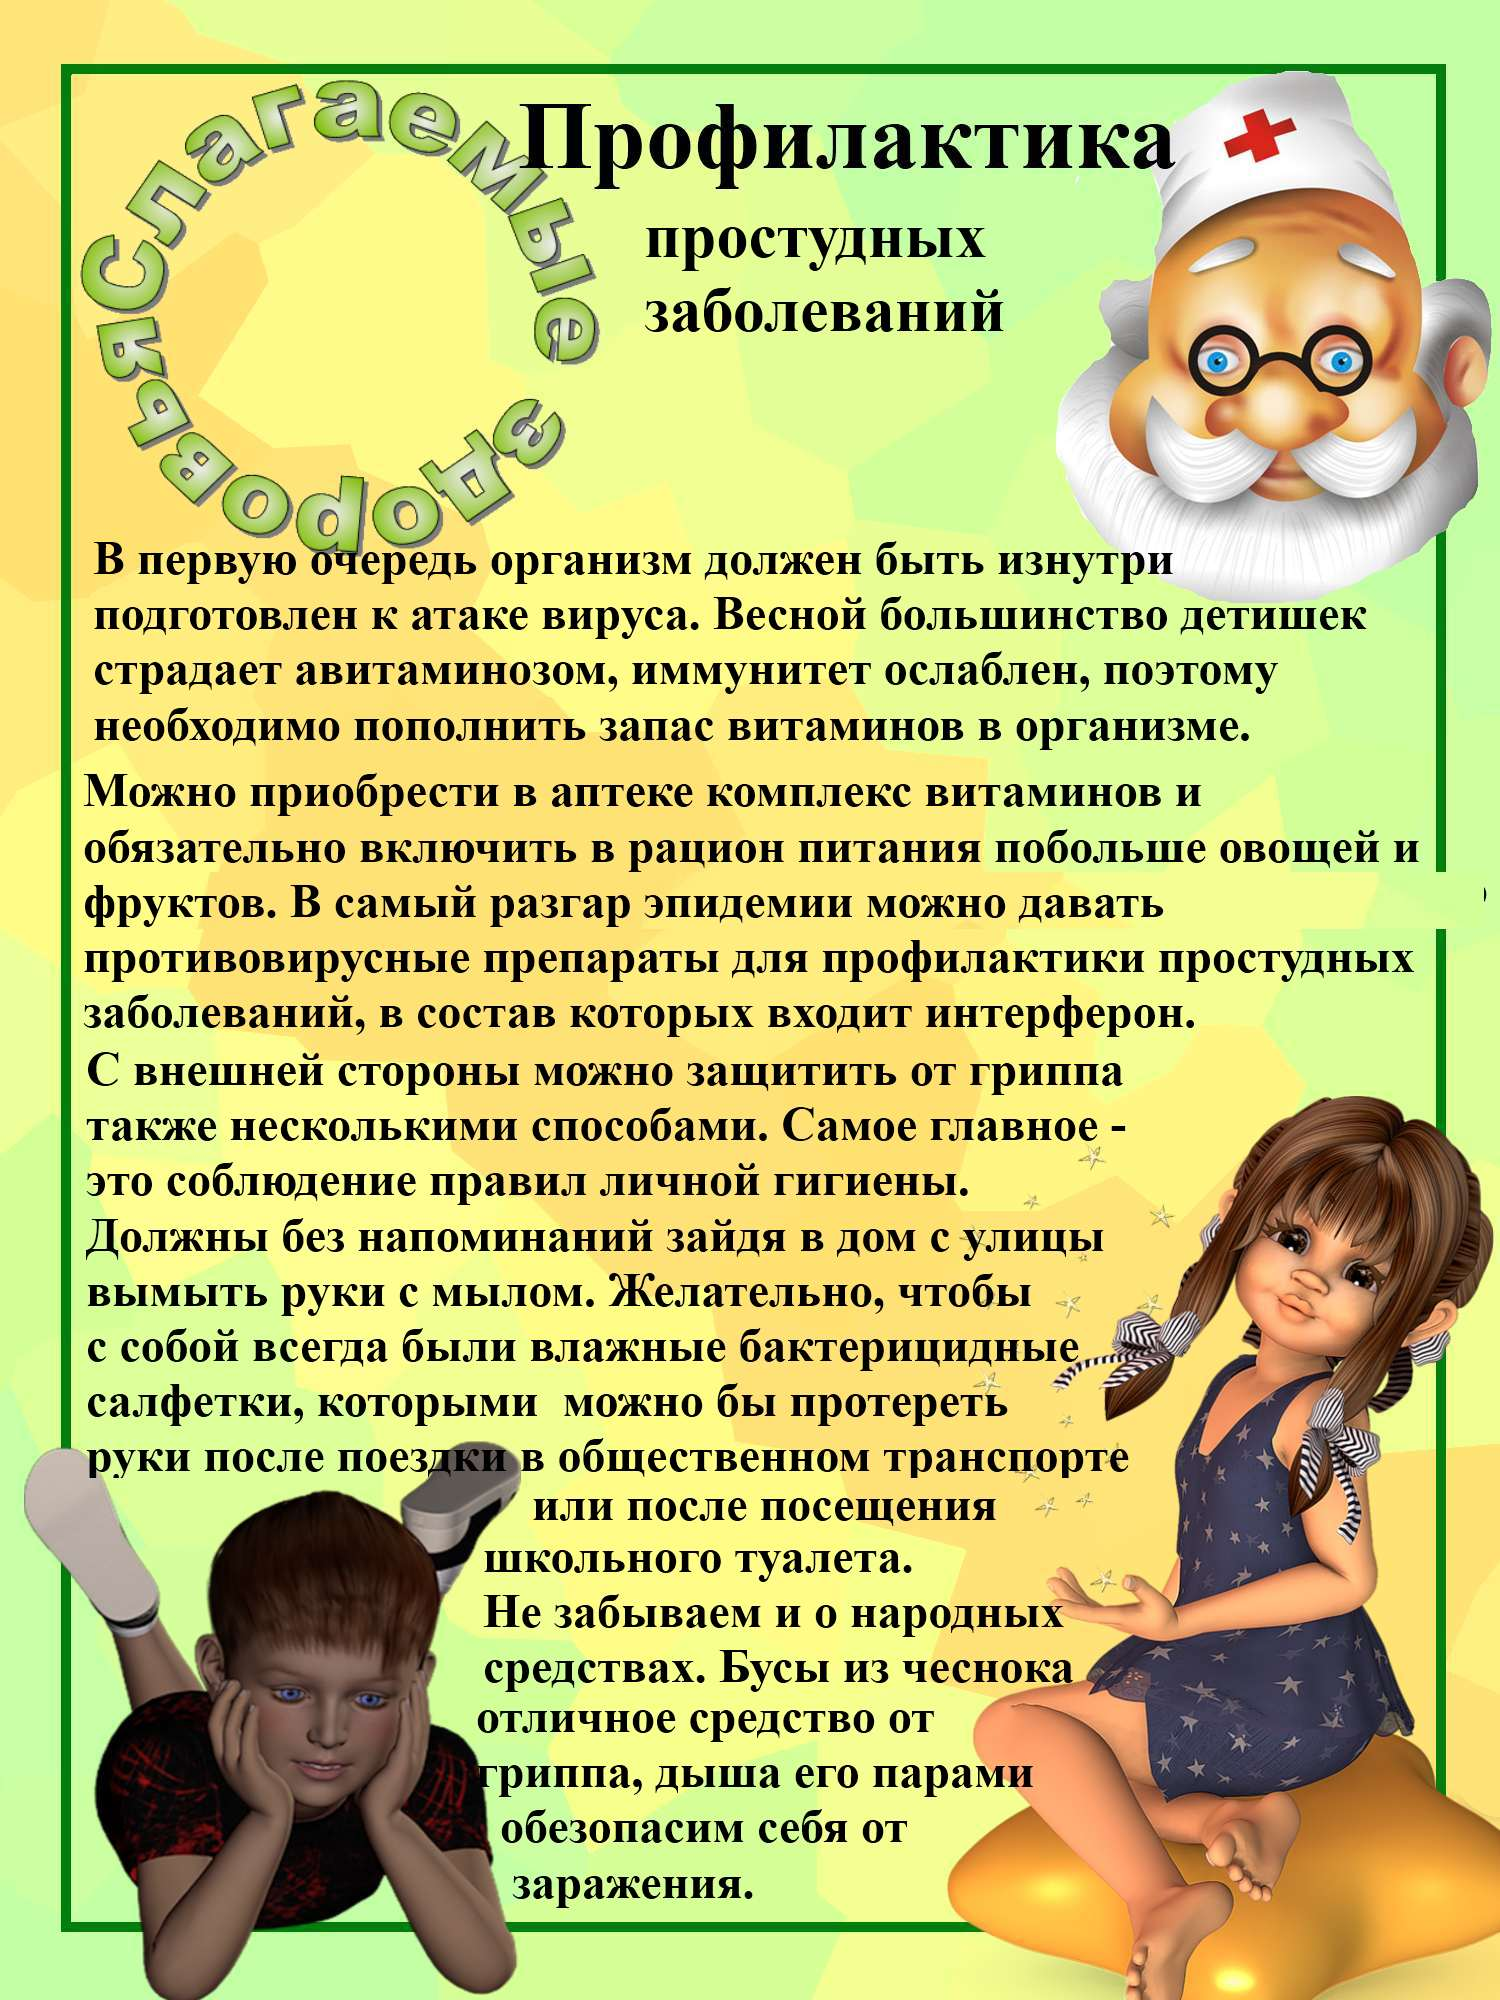 hello_html_m7ad81184.jpg